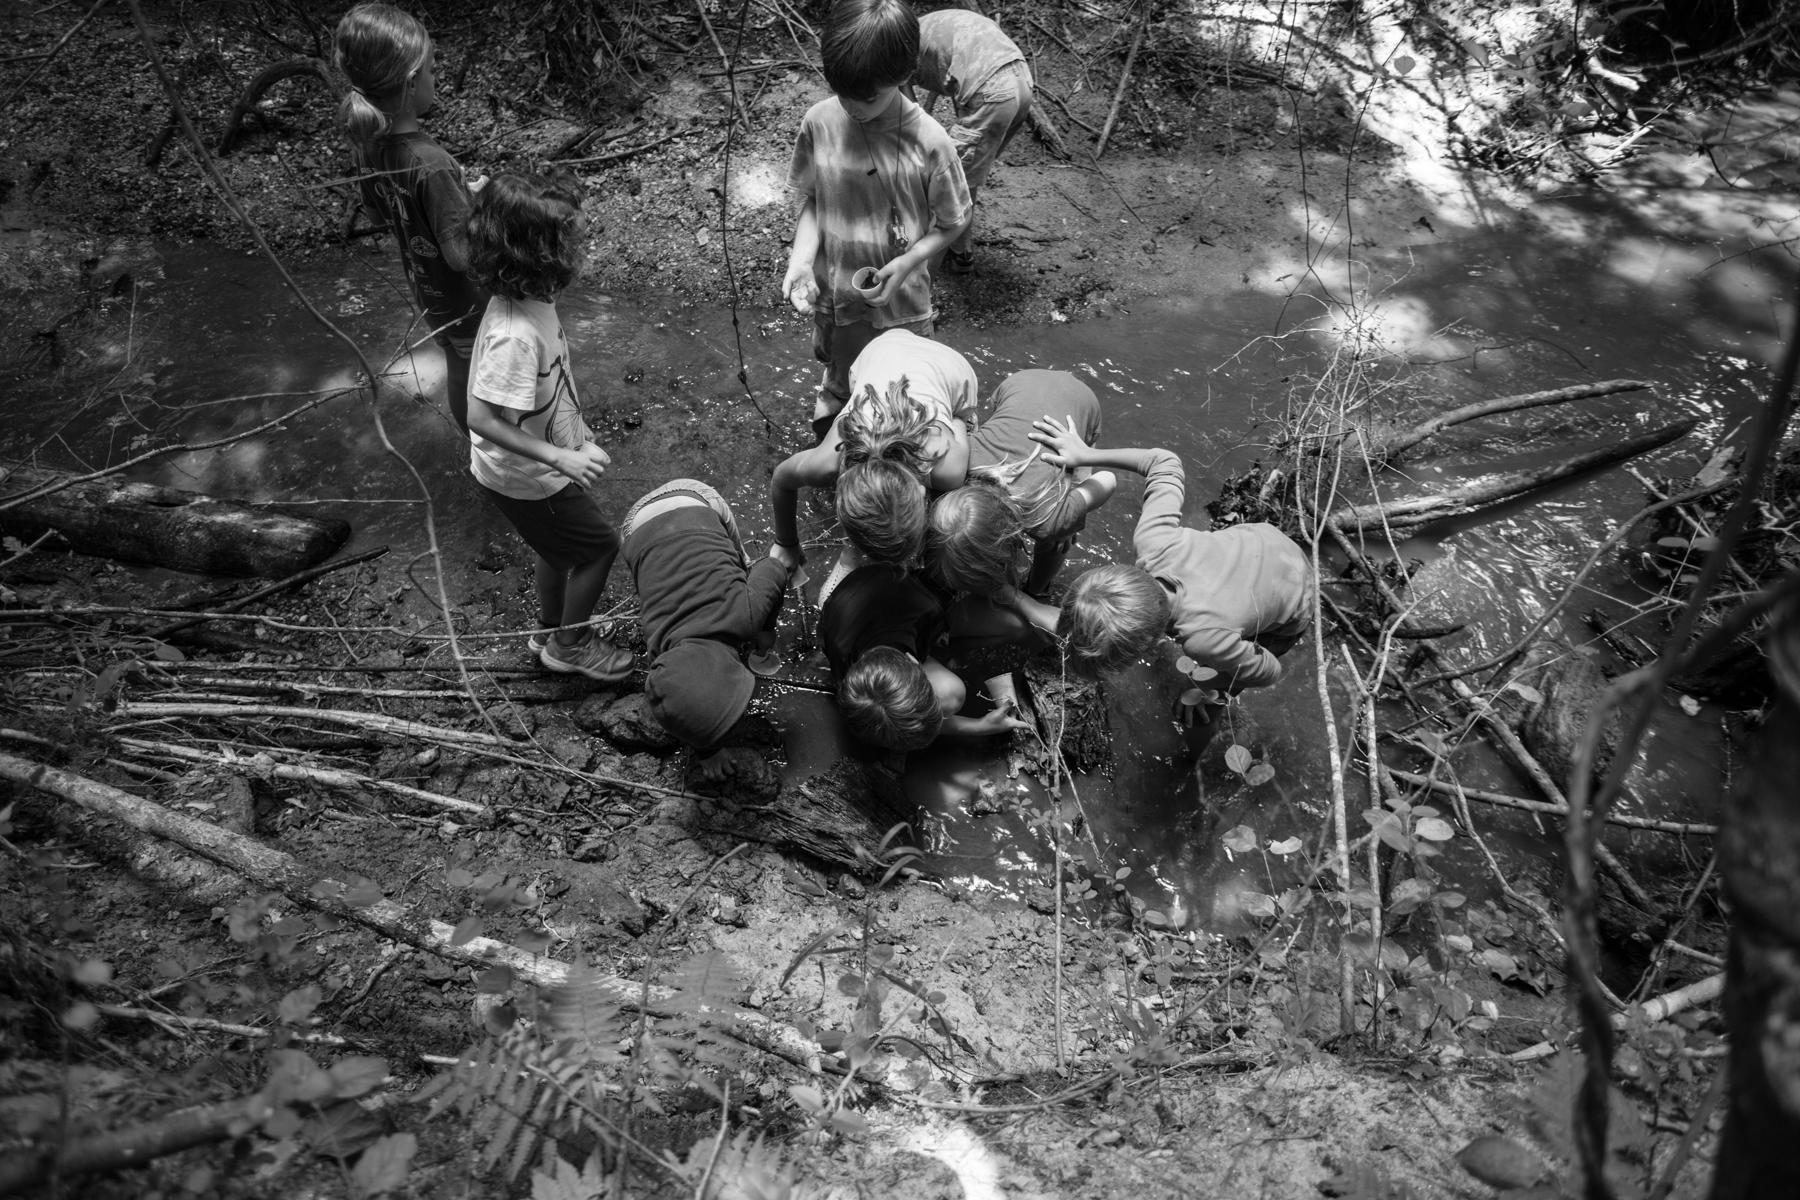 RA_story of the land camp-201606277552.jpg